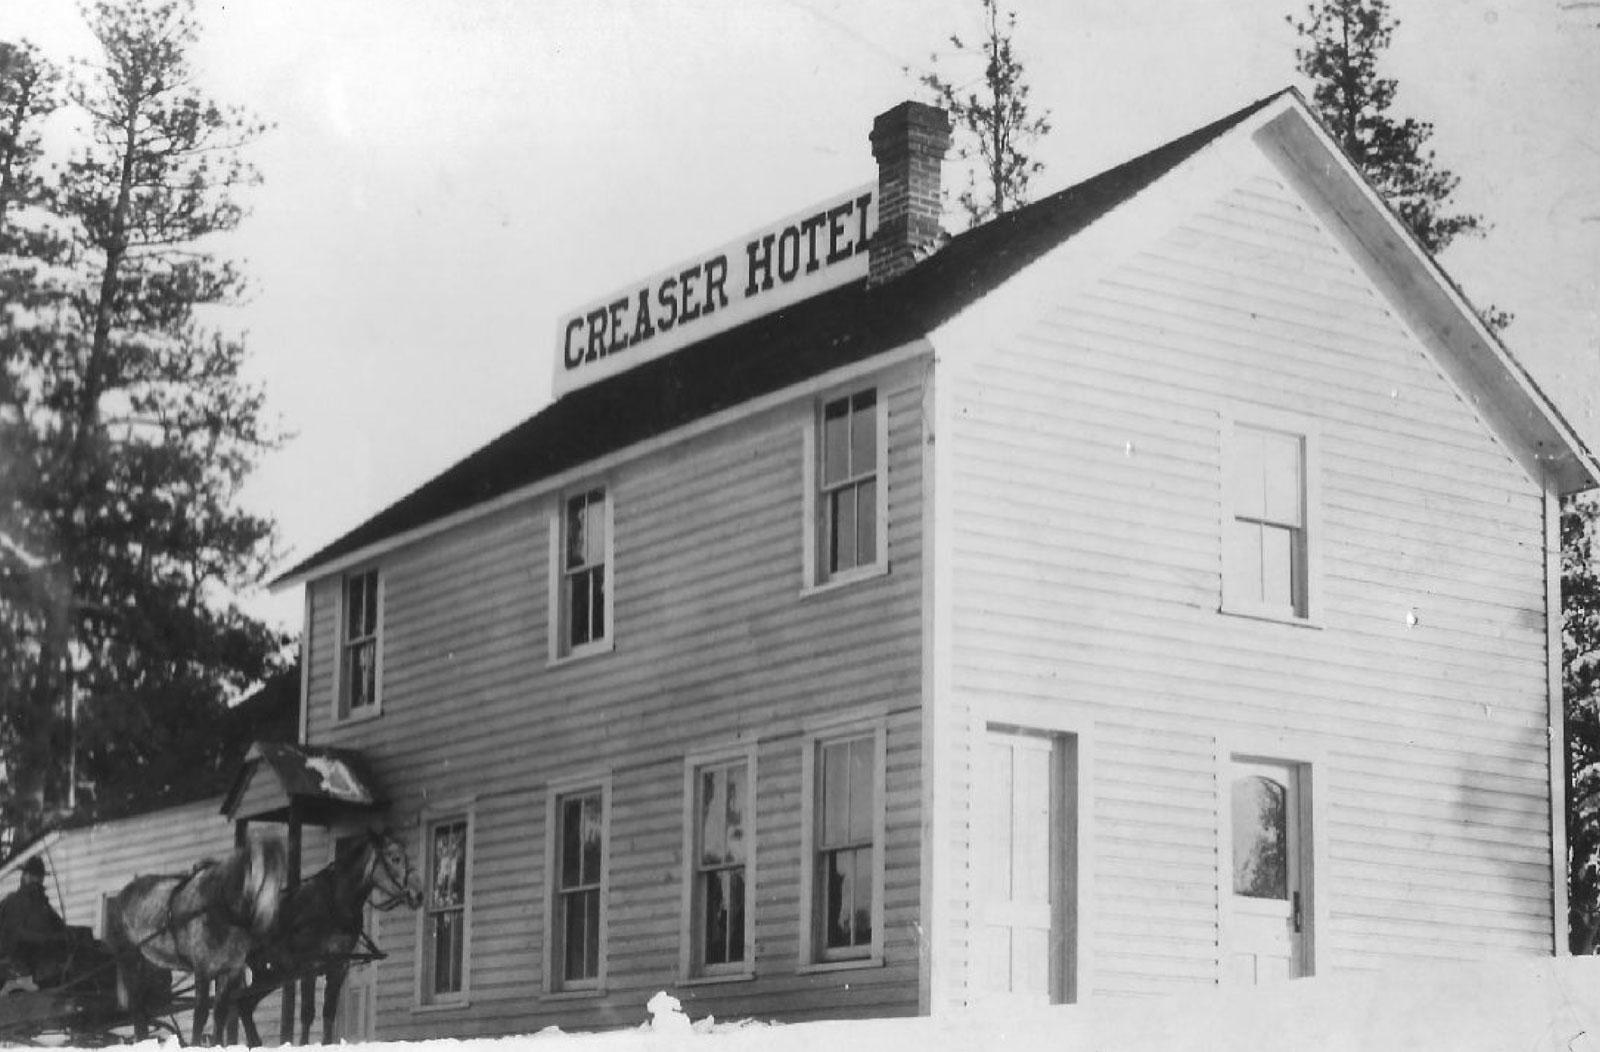 The Creaser Hotel in Republic, Washington